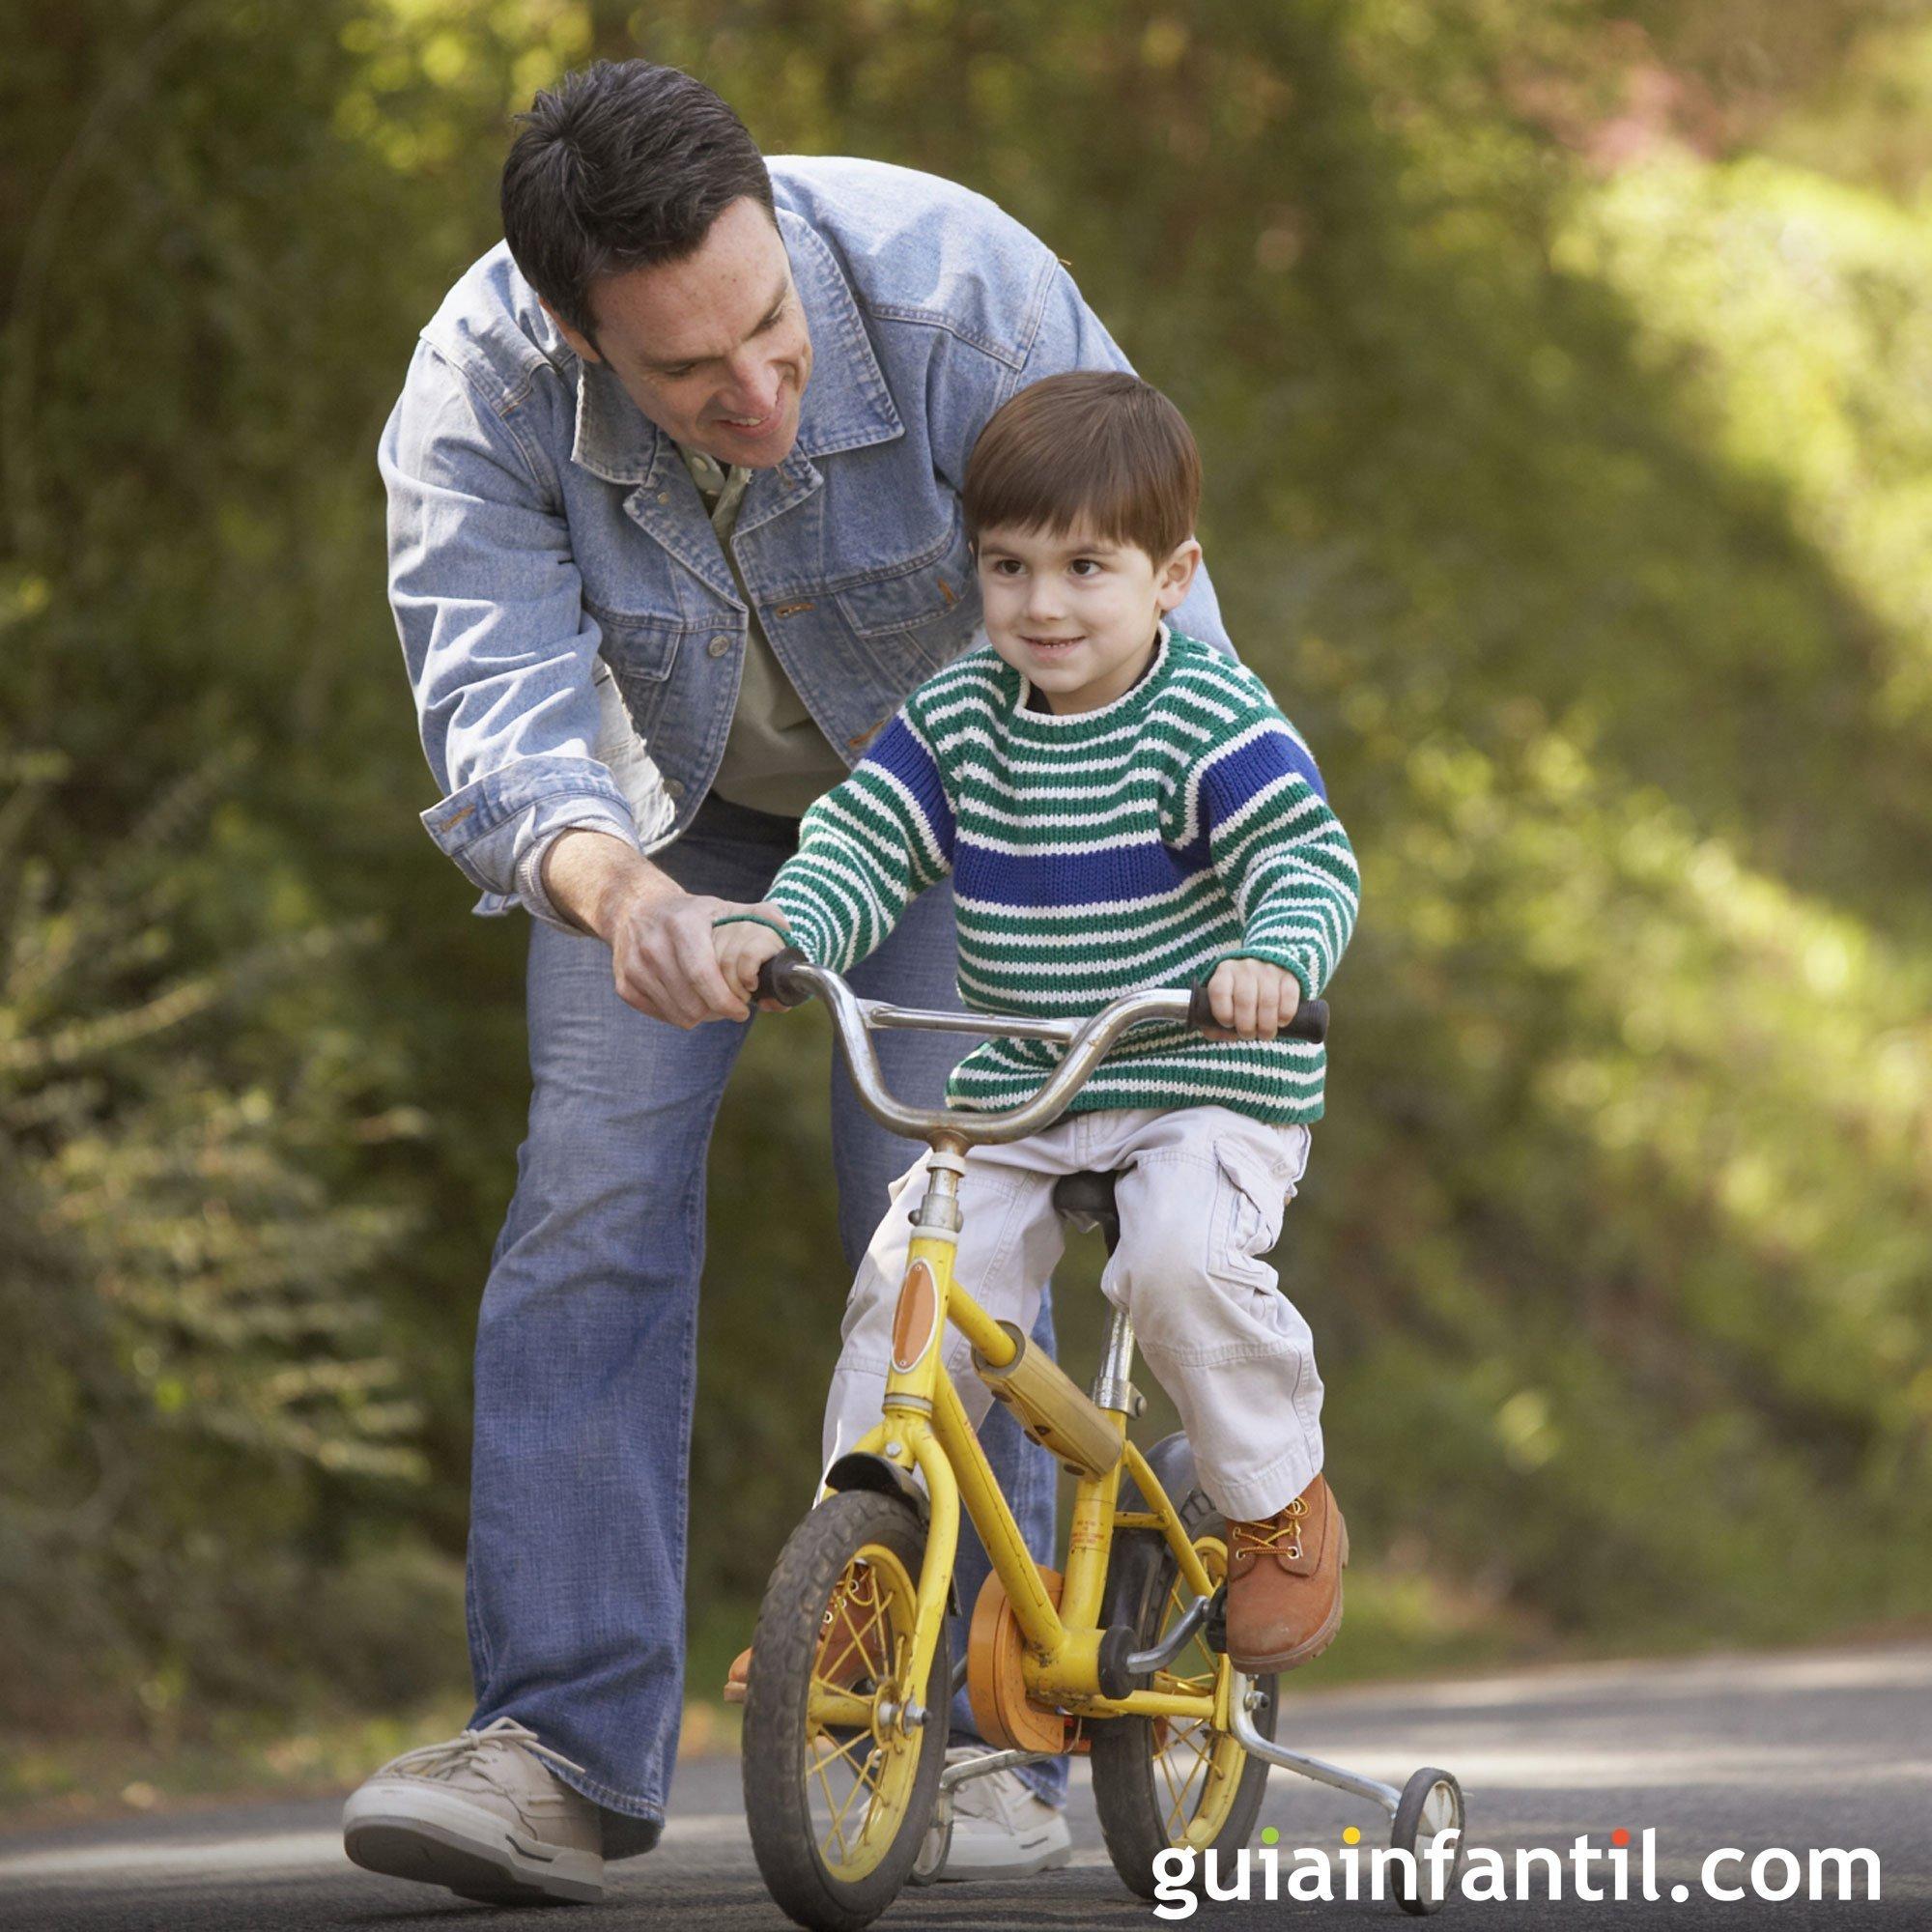 Jugar con papá a montar en bicicleta